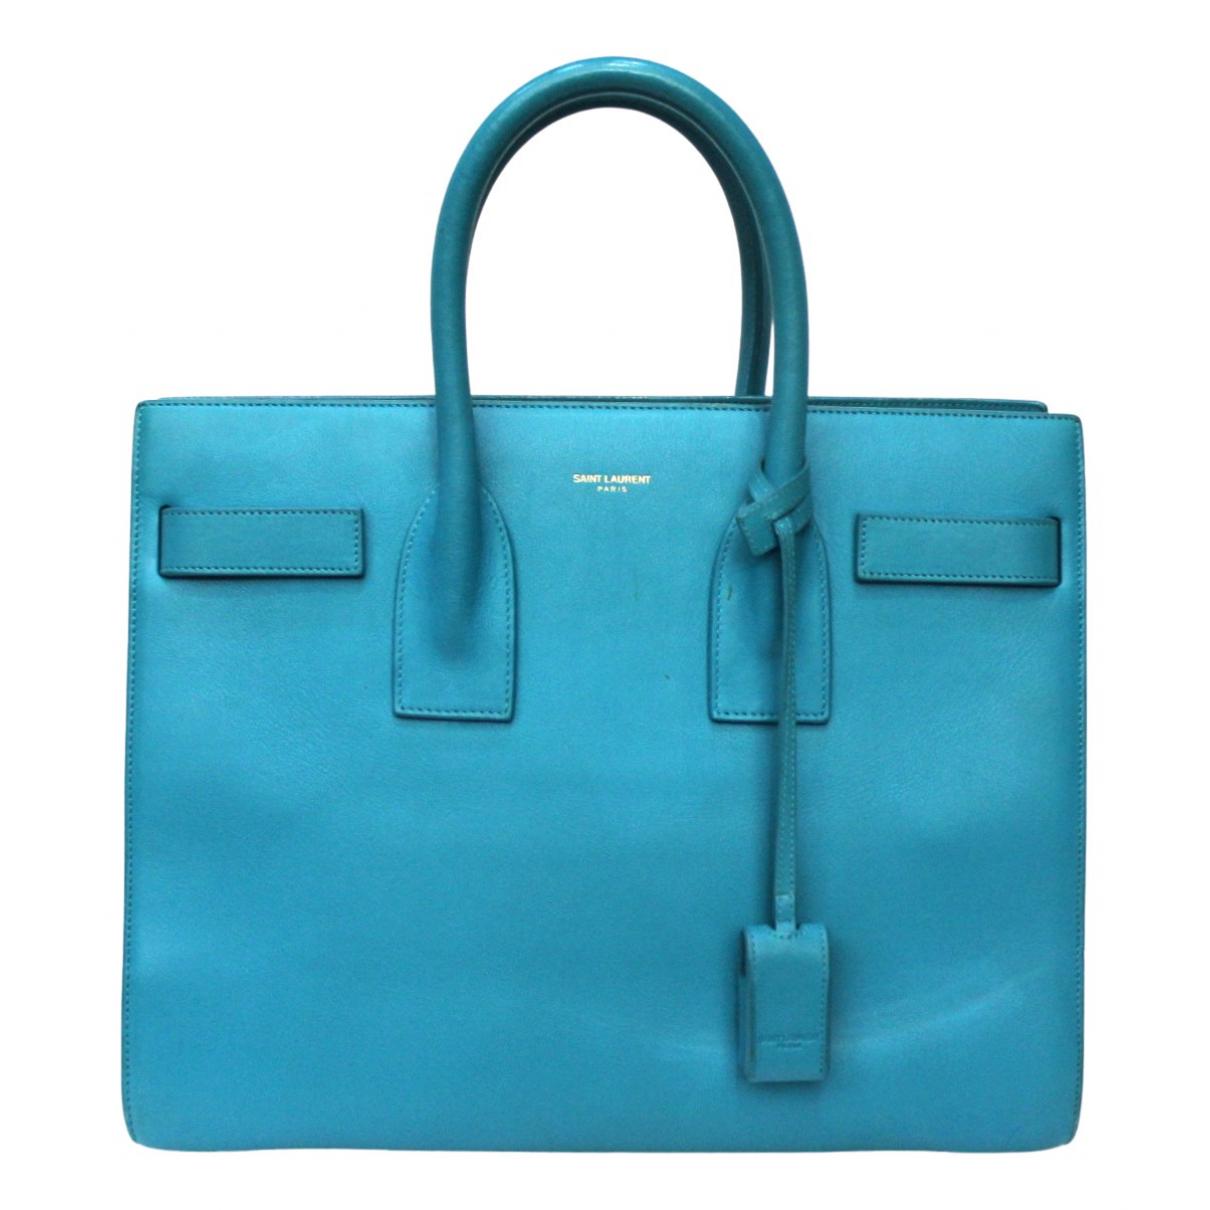 Saint Laurent \N Blue Leather handbag for Women \N